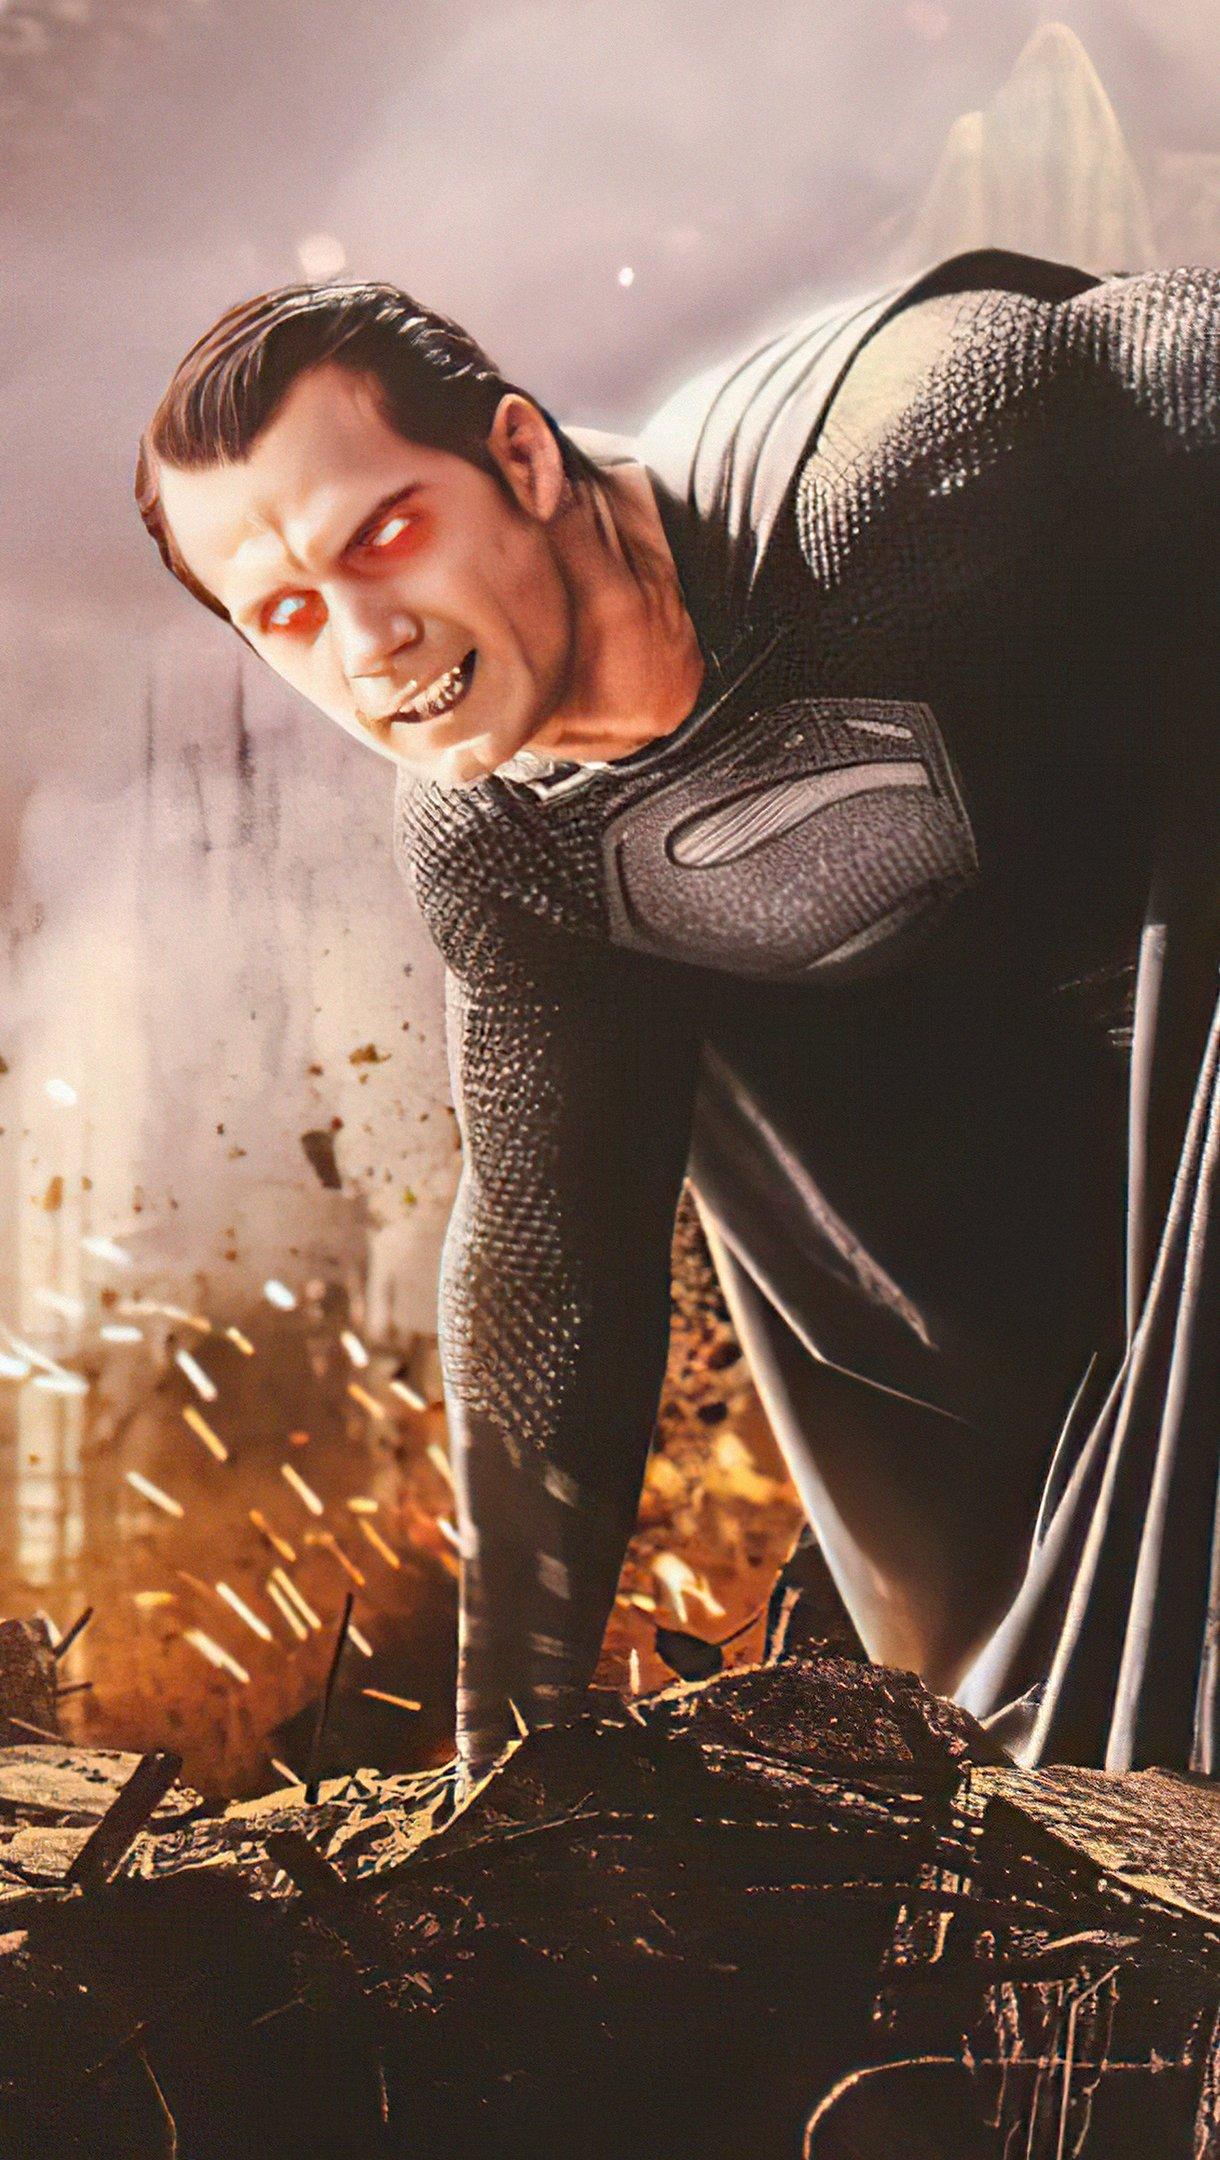 Fondos de pantalla Superman Snyder cut Vertical